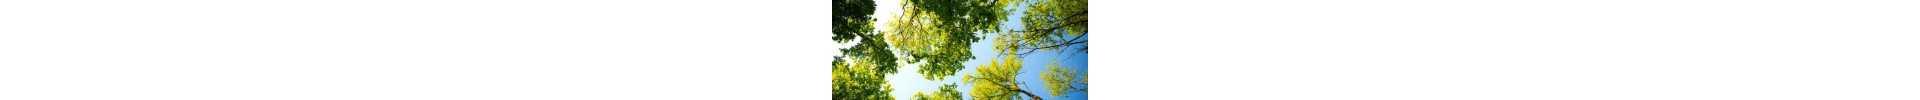 COMBINATIONS - MULTI FLOWER